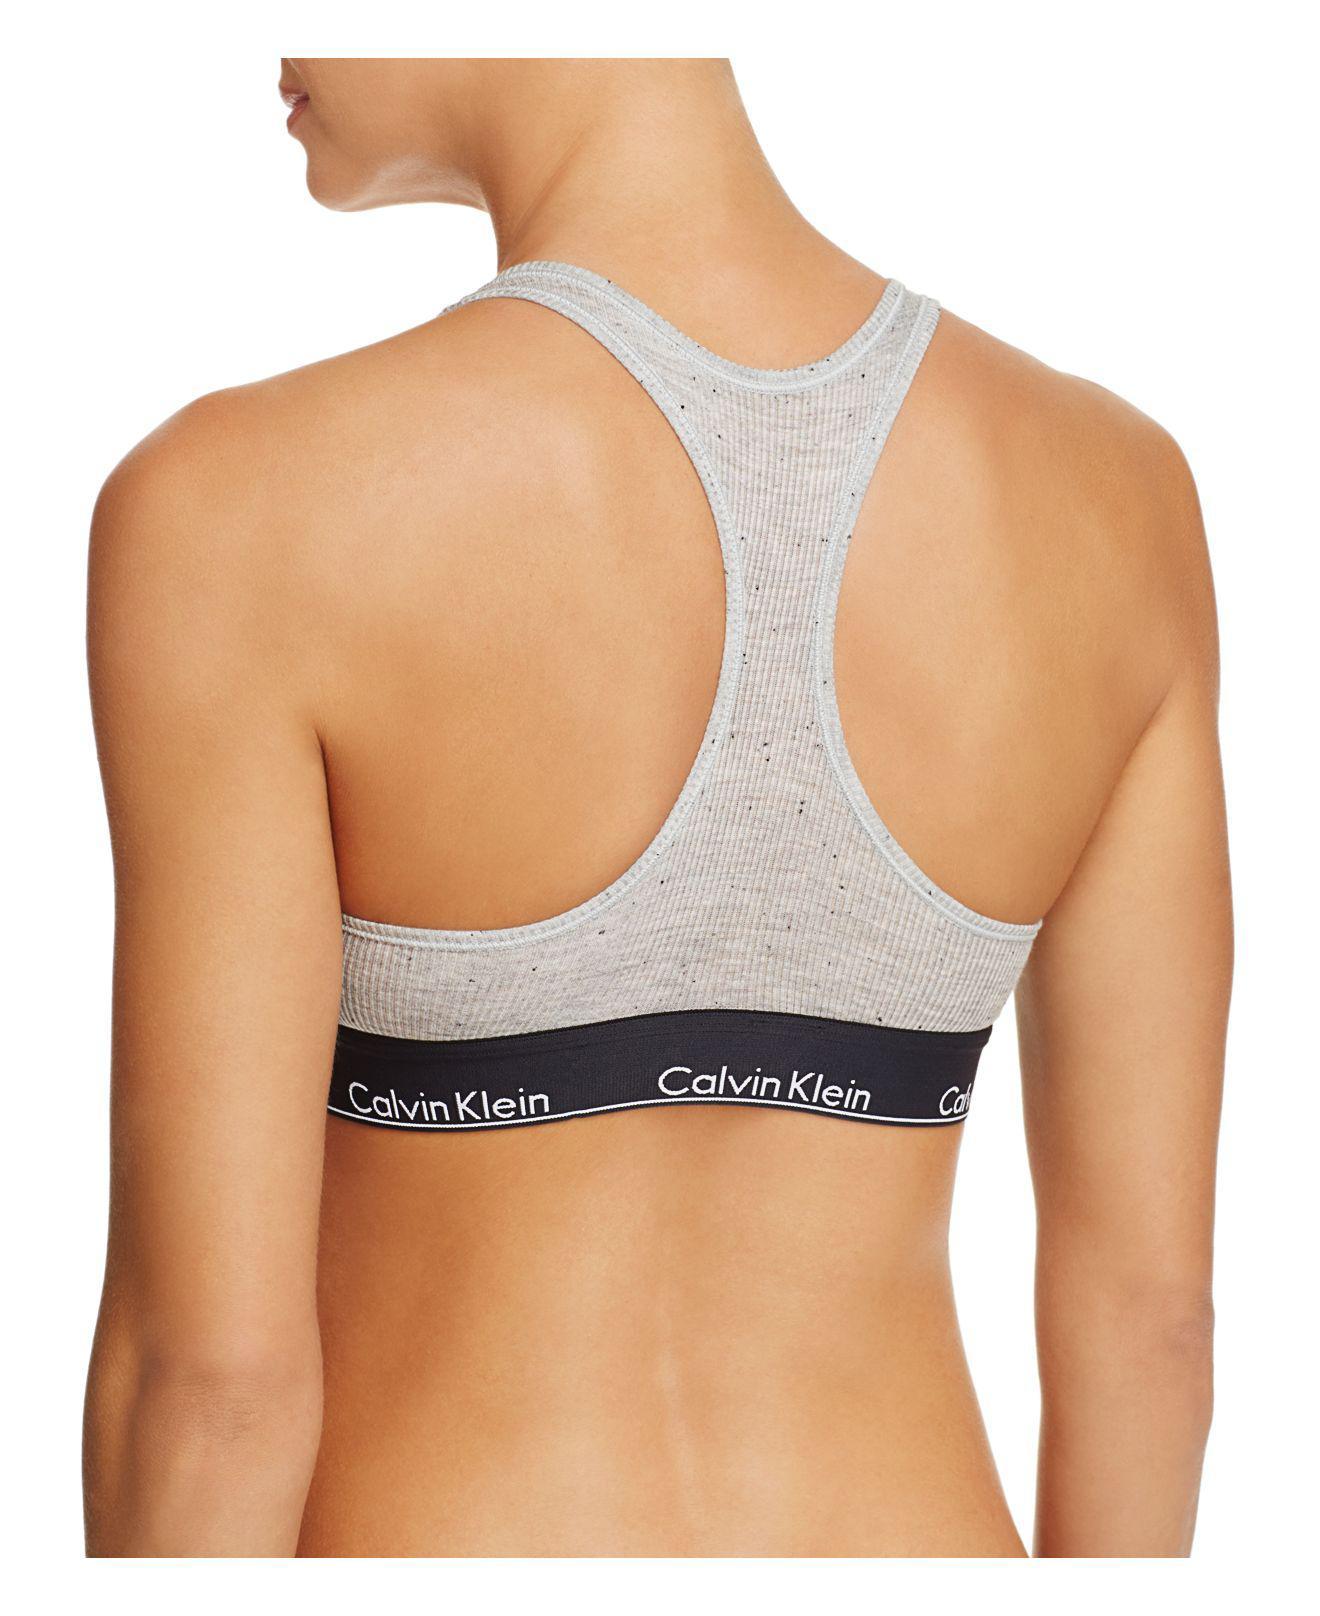 fef09ae9b9f97c Lyst - Calvin Klein Modern Cotton Graphic Ribbed Bralette in Gray